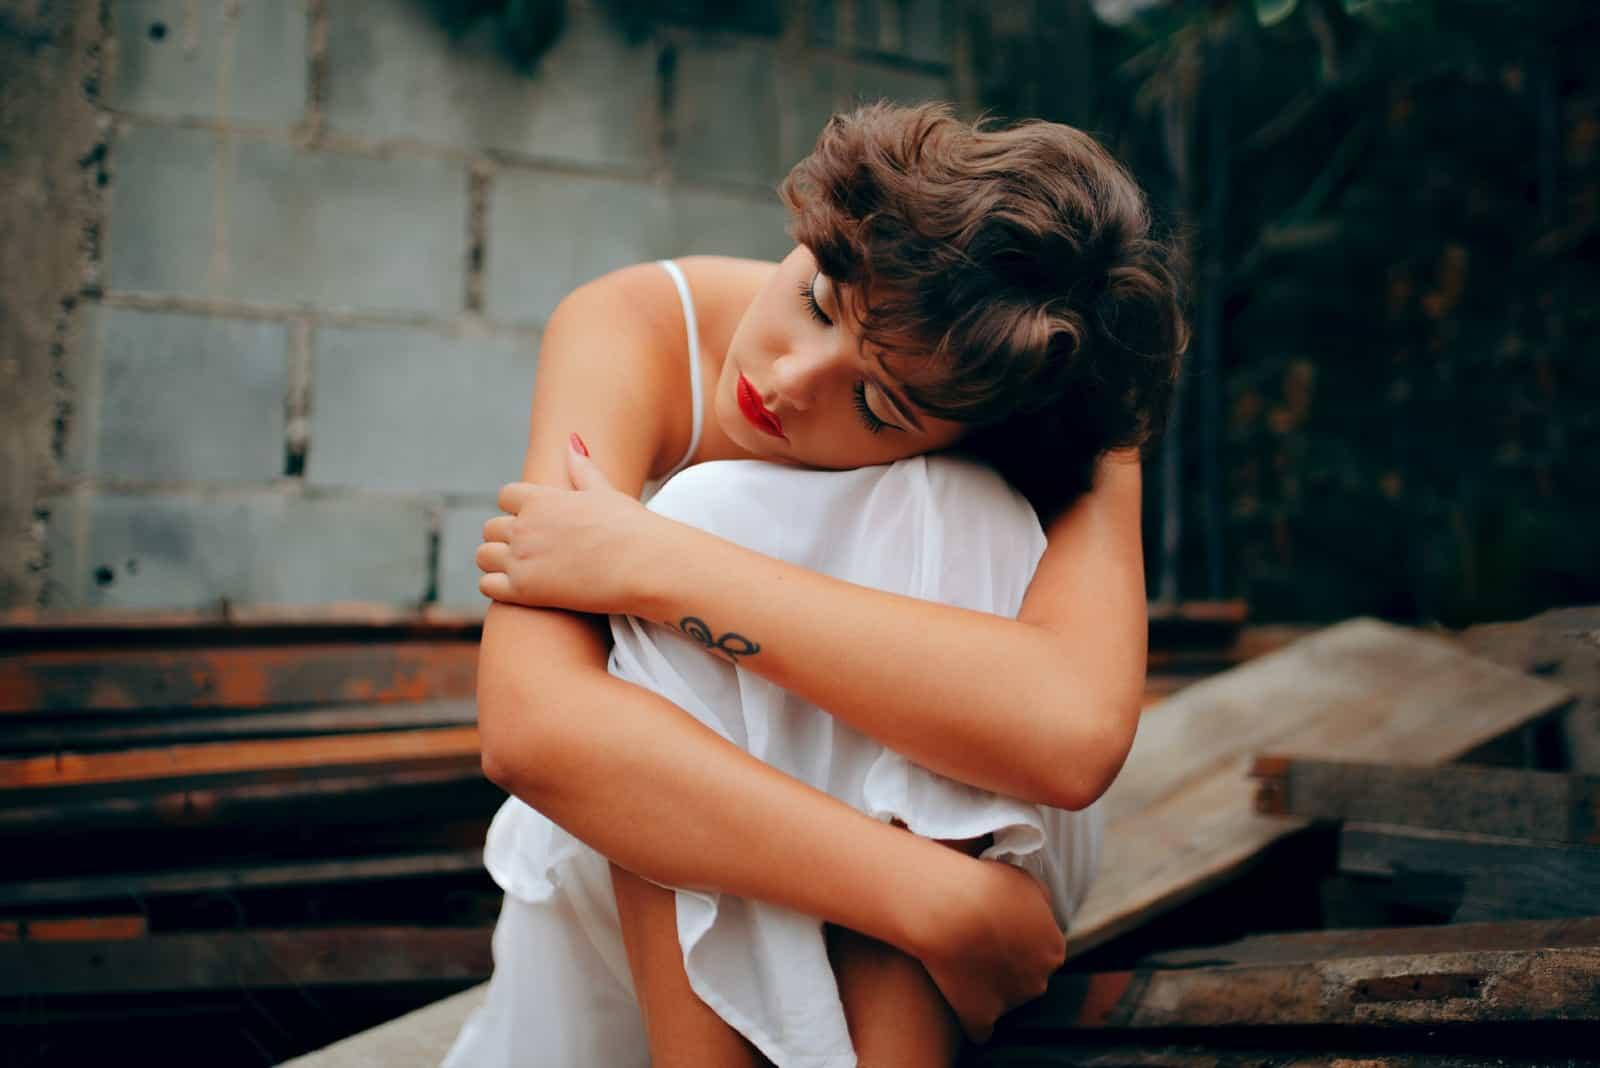 femme triste en robe blanche serrant ses genoux